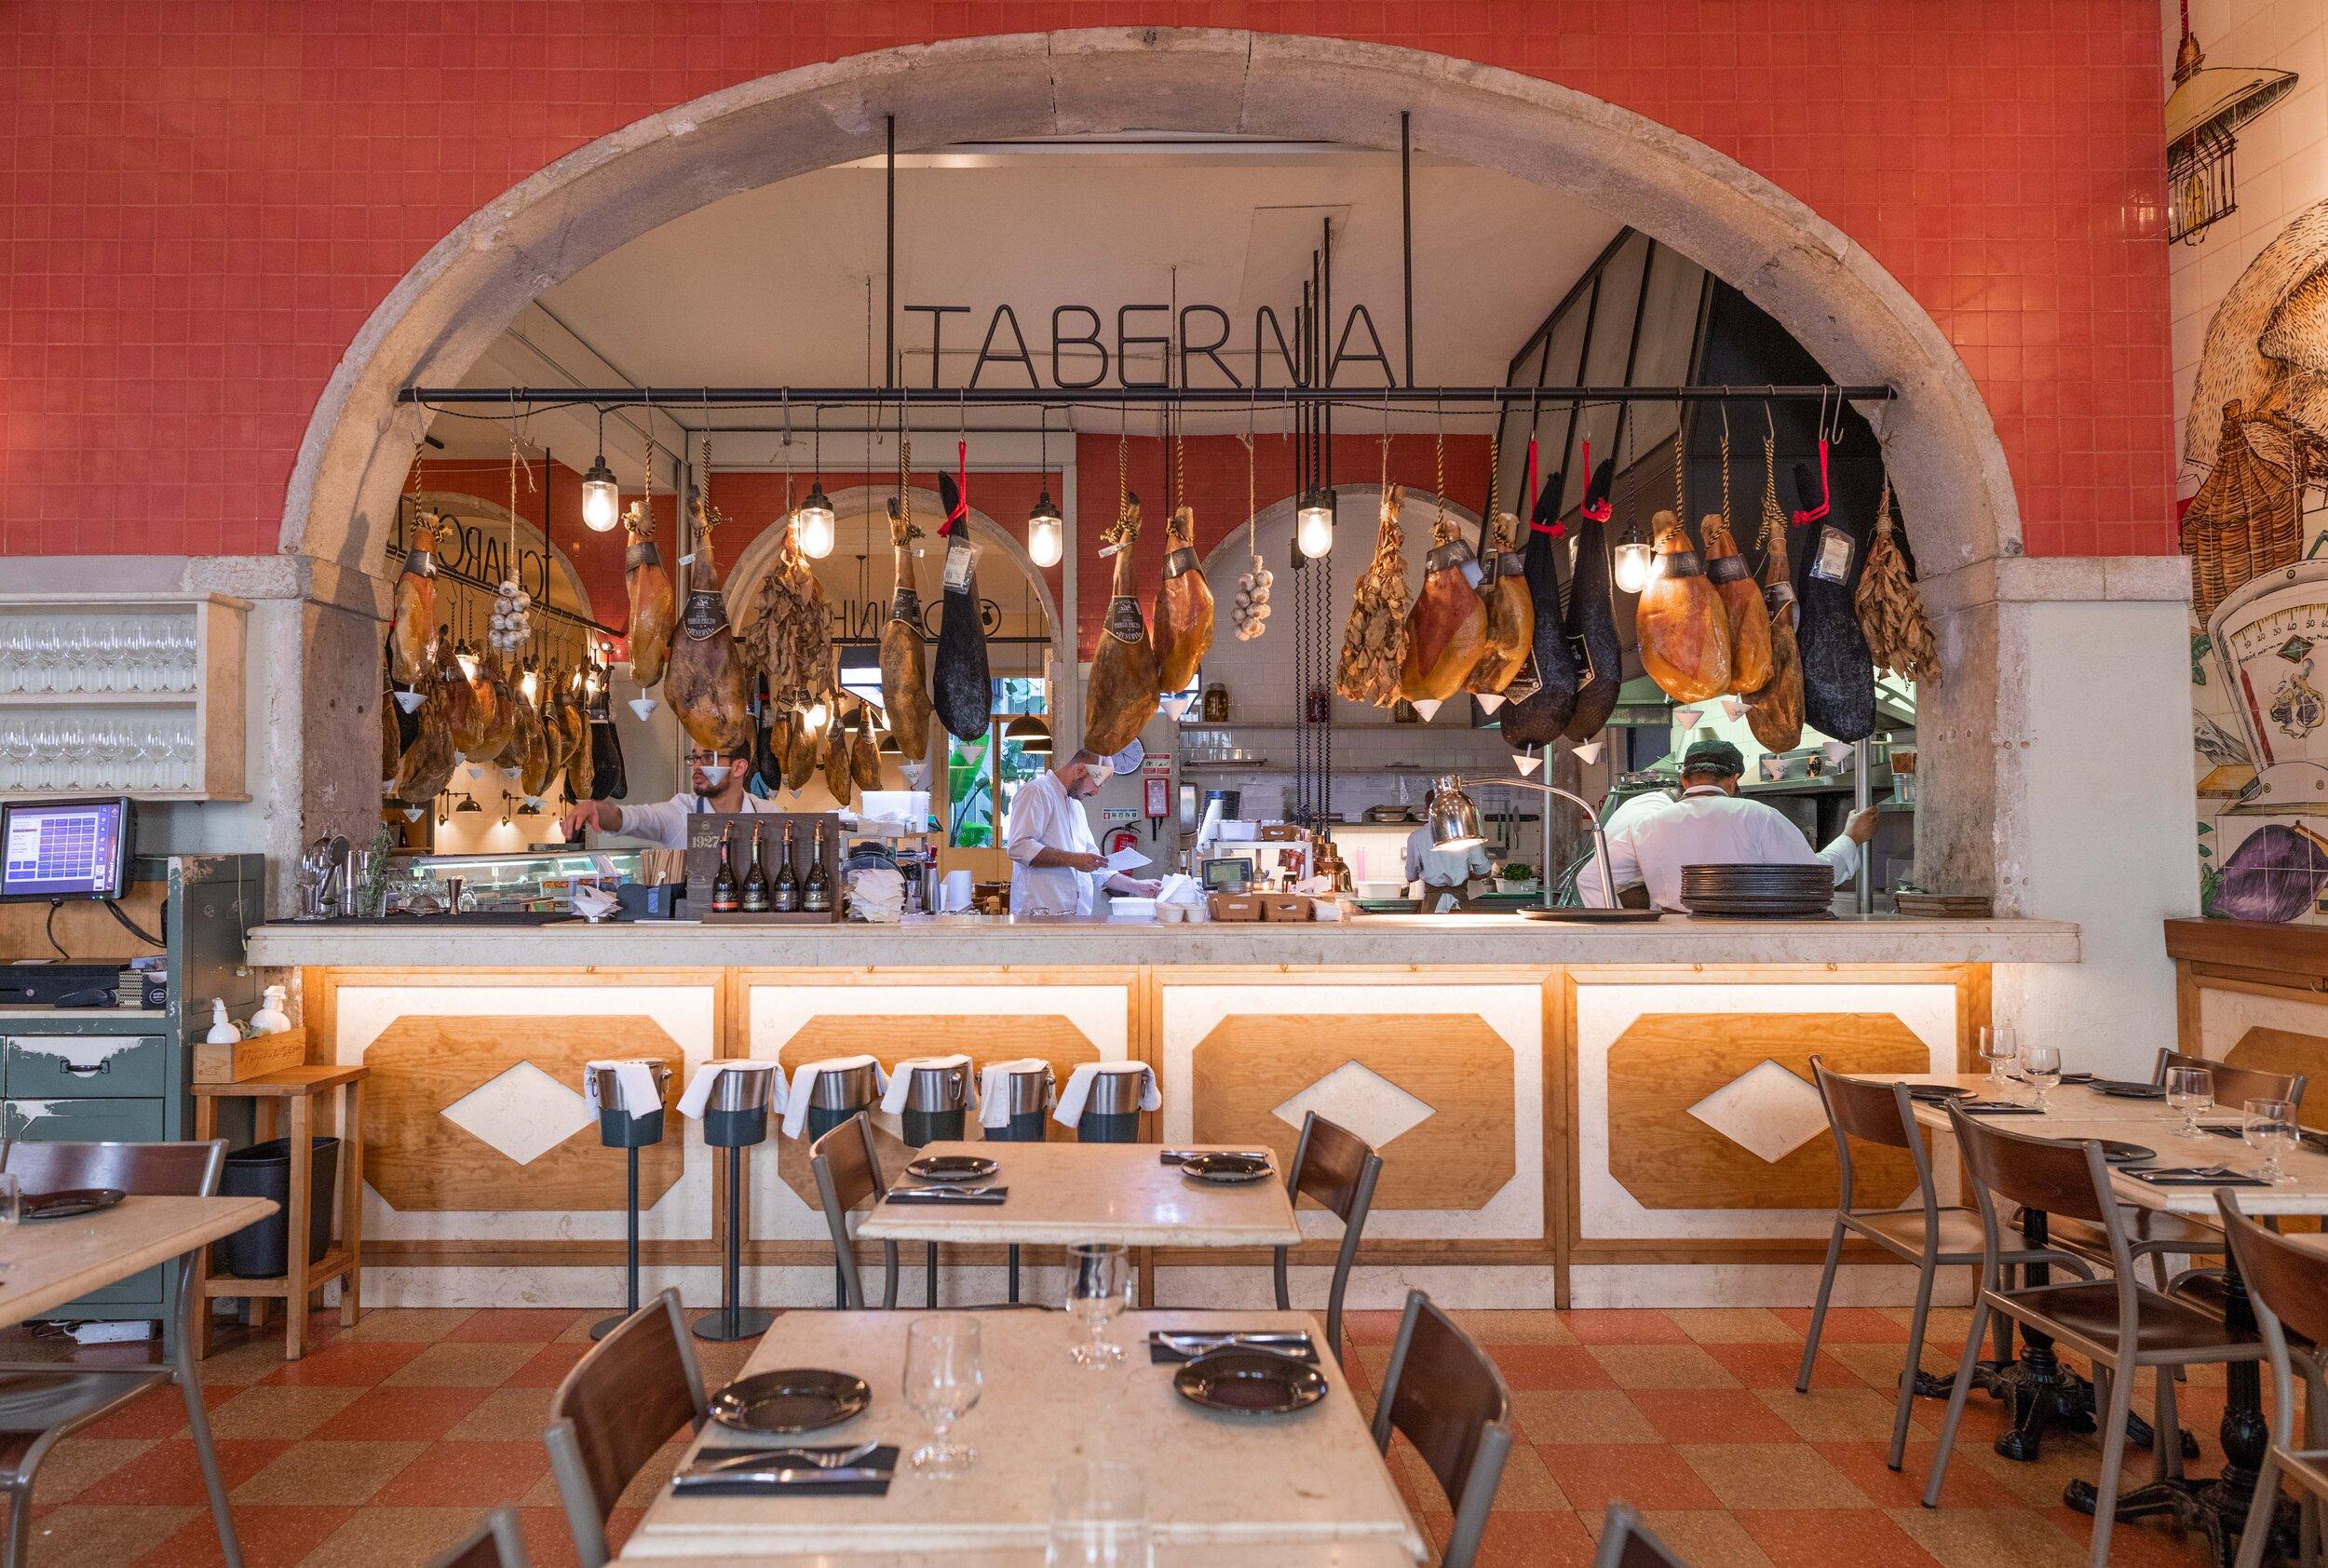 Inside Taberna Bairro do Avillez